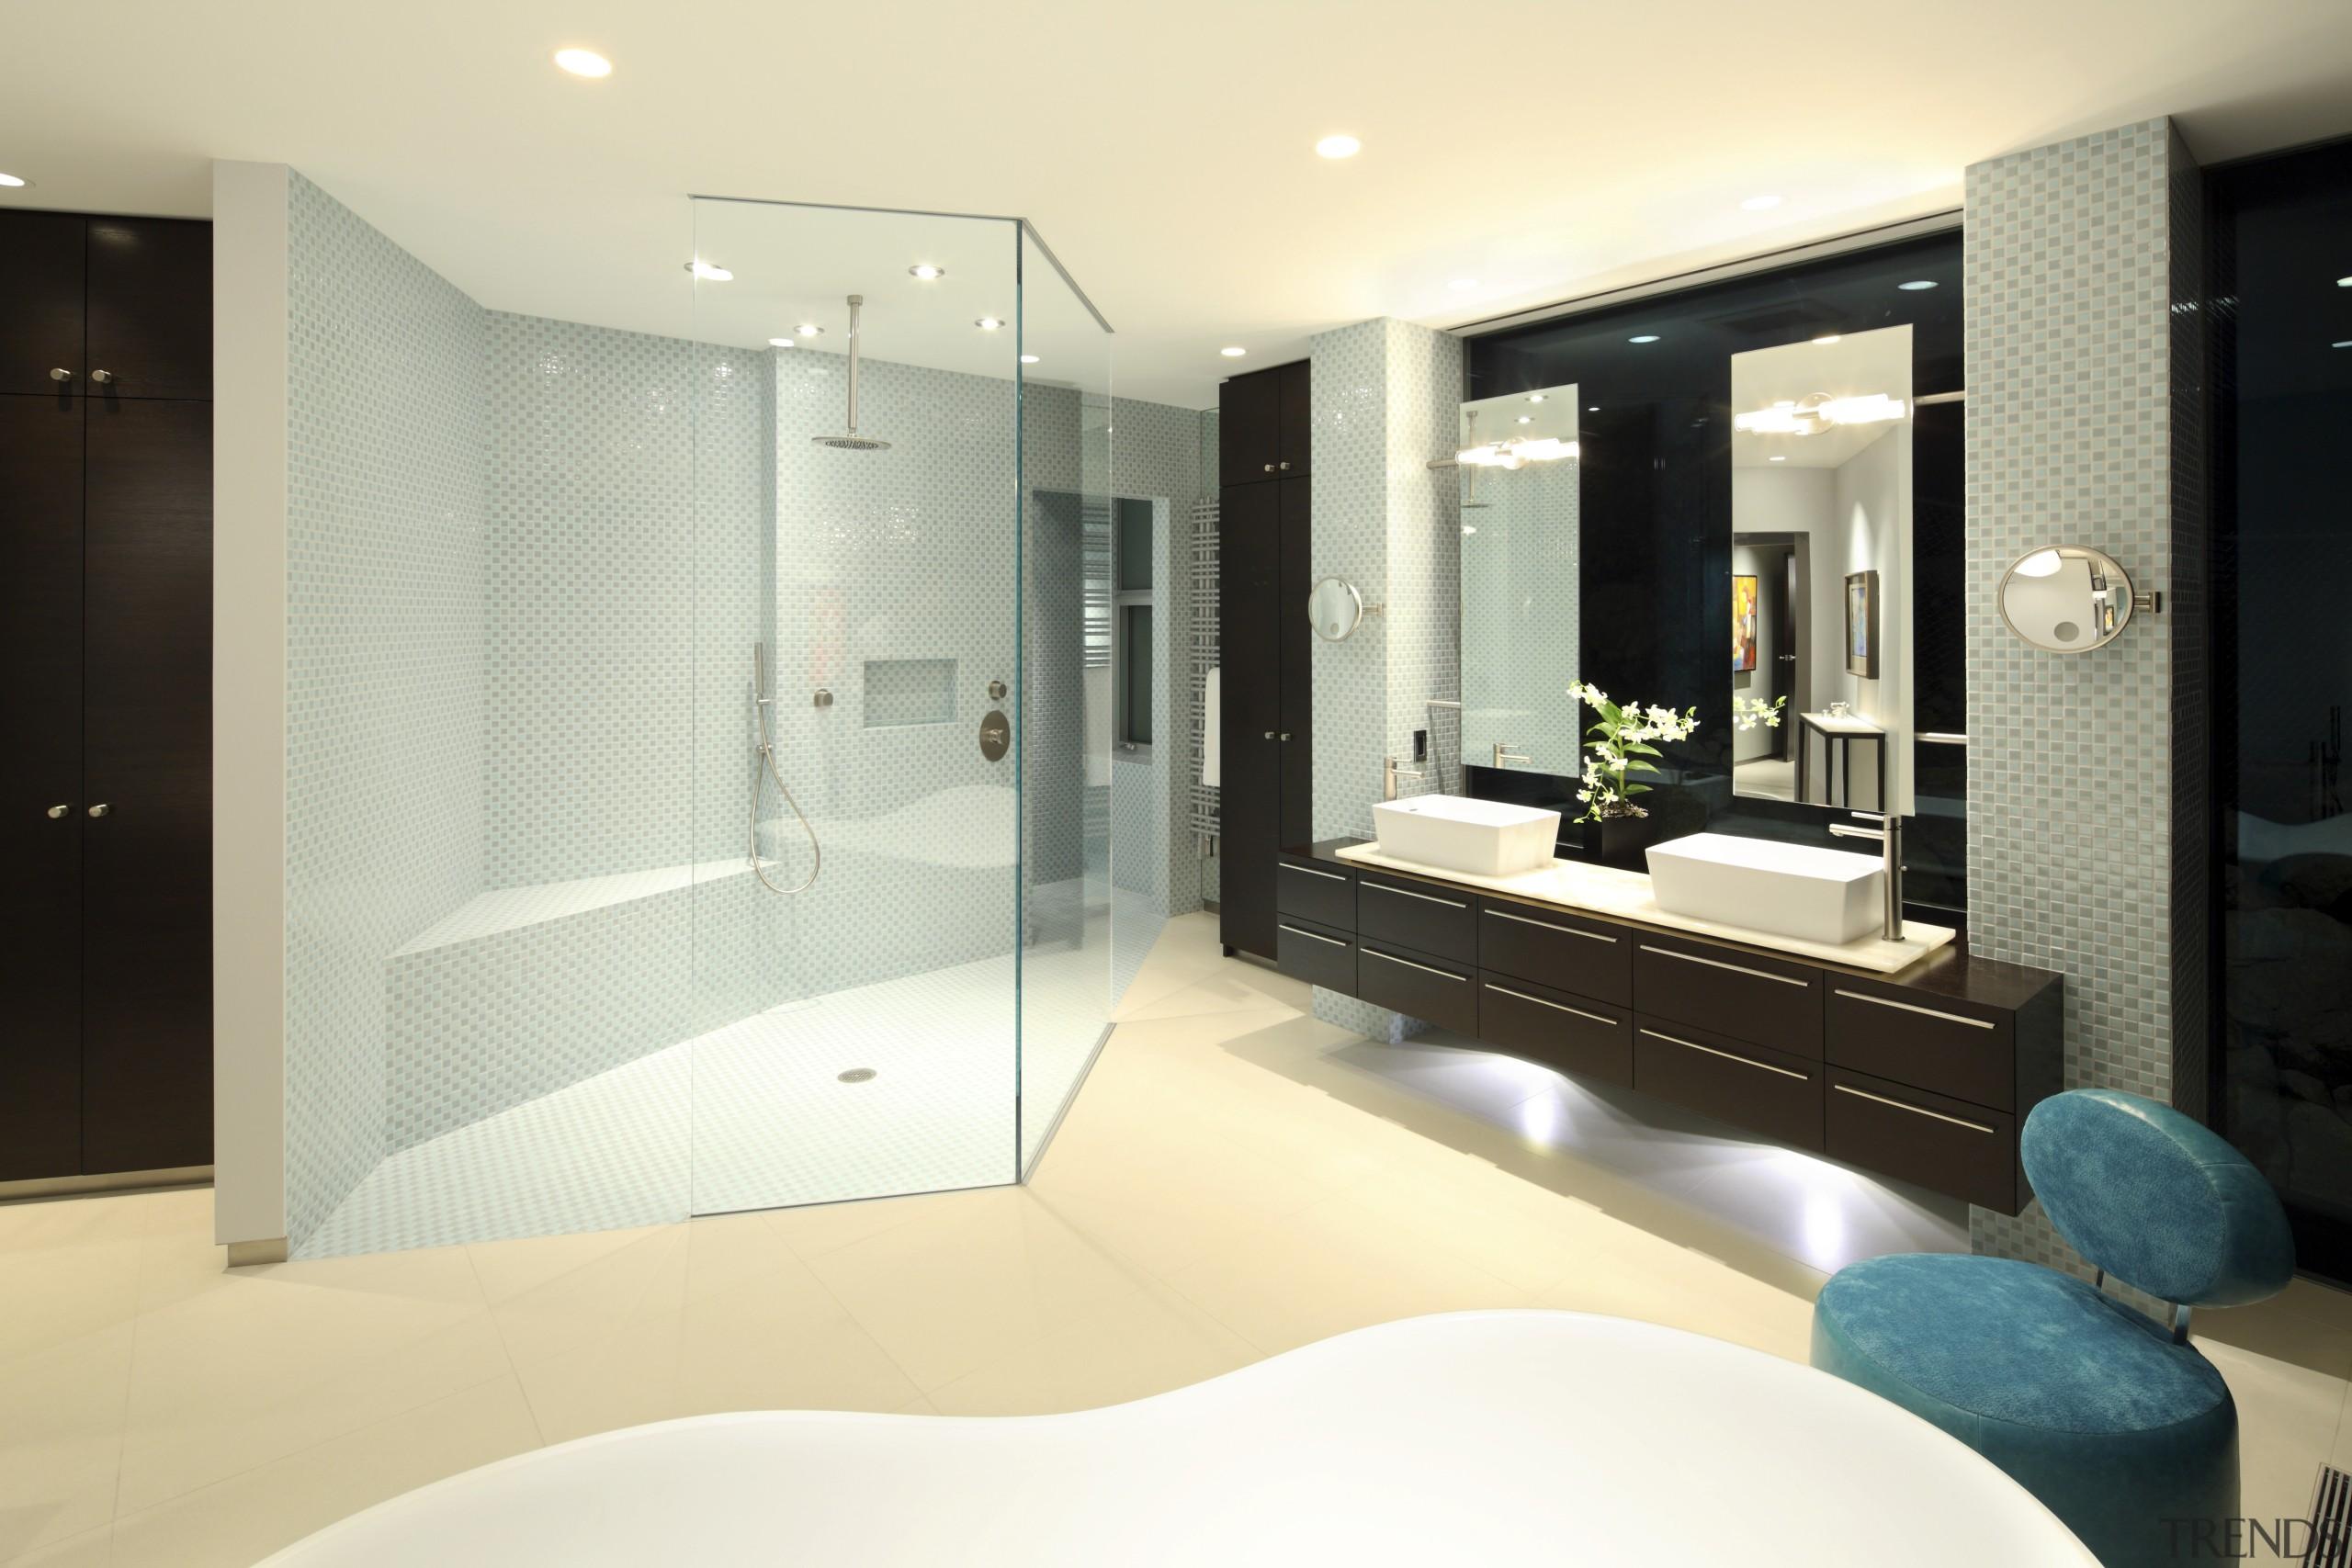 View of bathroom with cream flooring, teal seat bathroom, floor, interior design, room, yellow